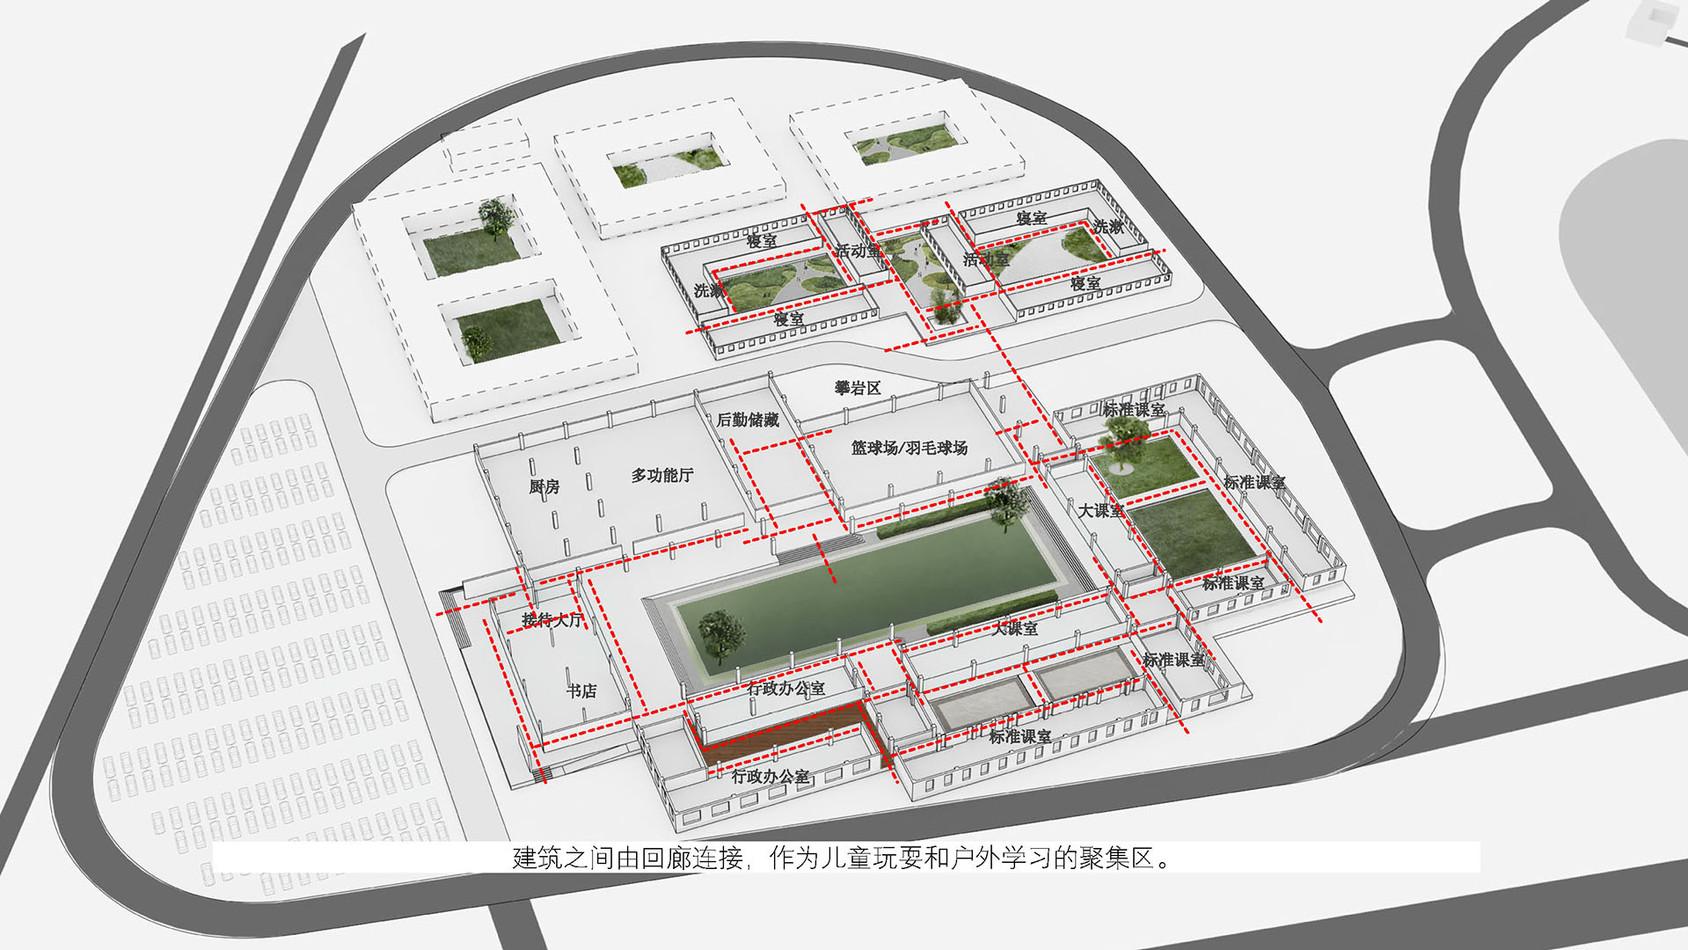 TAIHU-INTERNATIONAL-SCHOOL-CAMPUS-ZH 05.